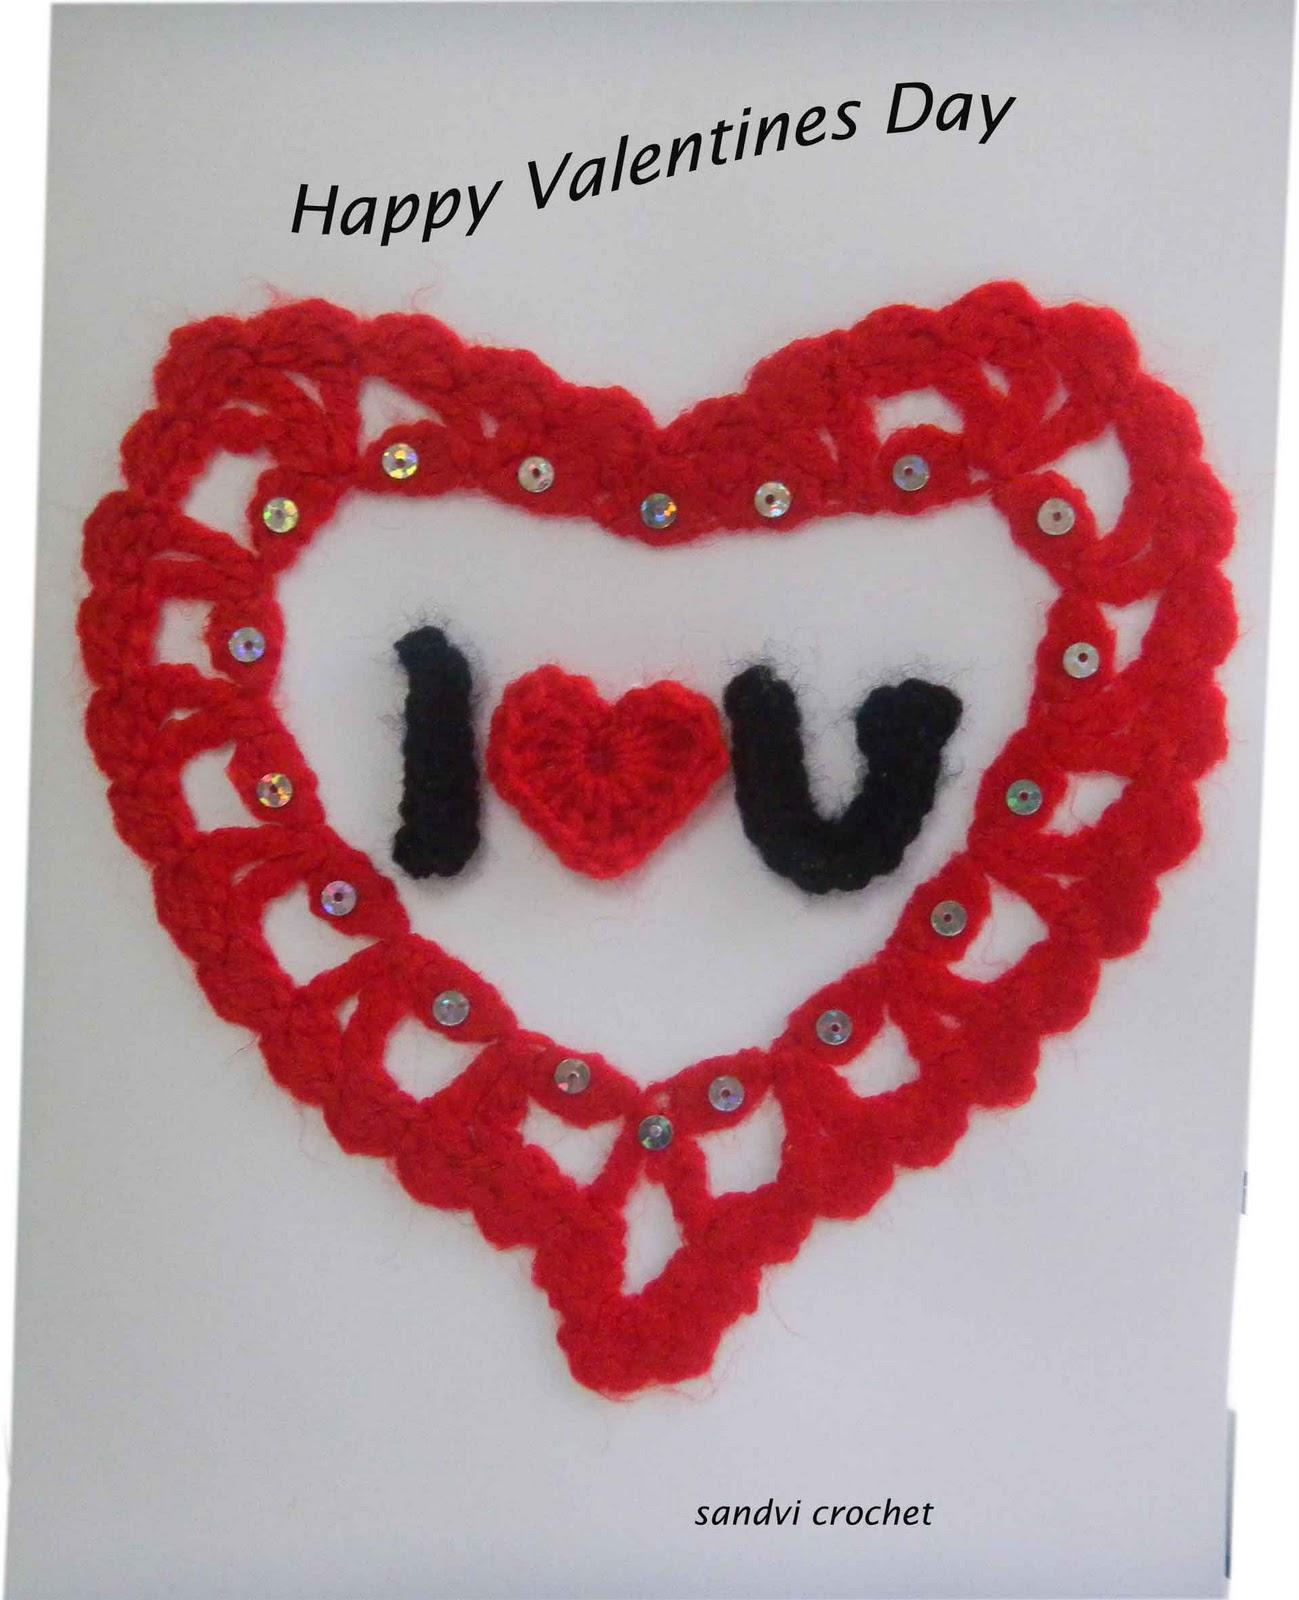 Crocheting For Valentines Day : sandvicrochet: Crochet Card for Valentines Day